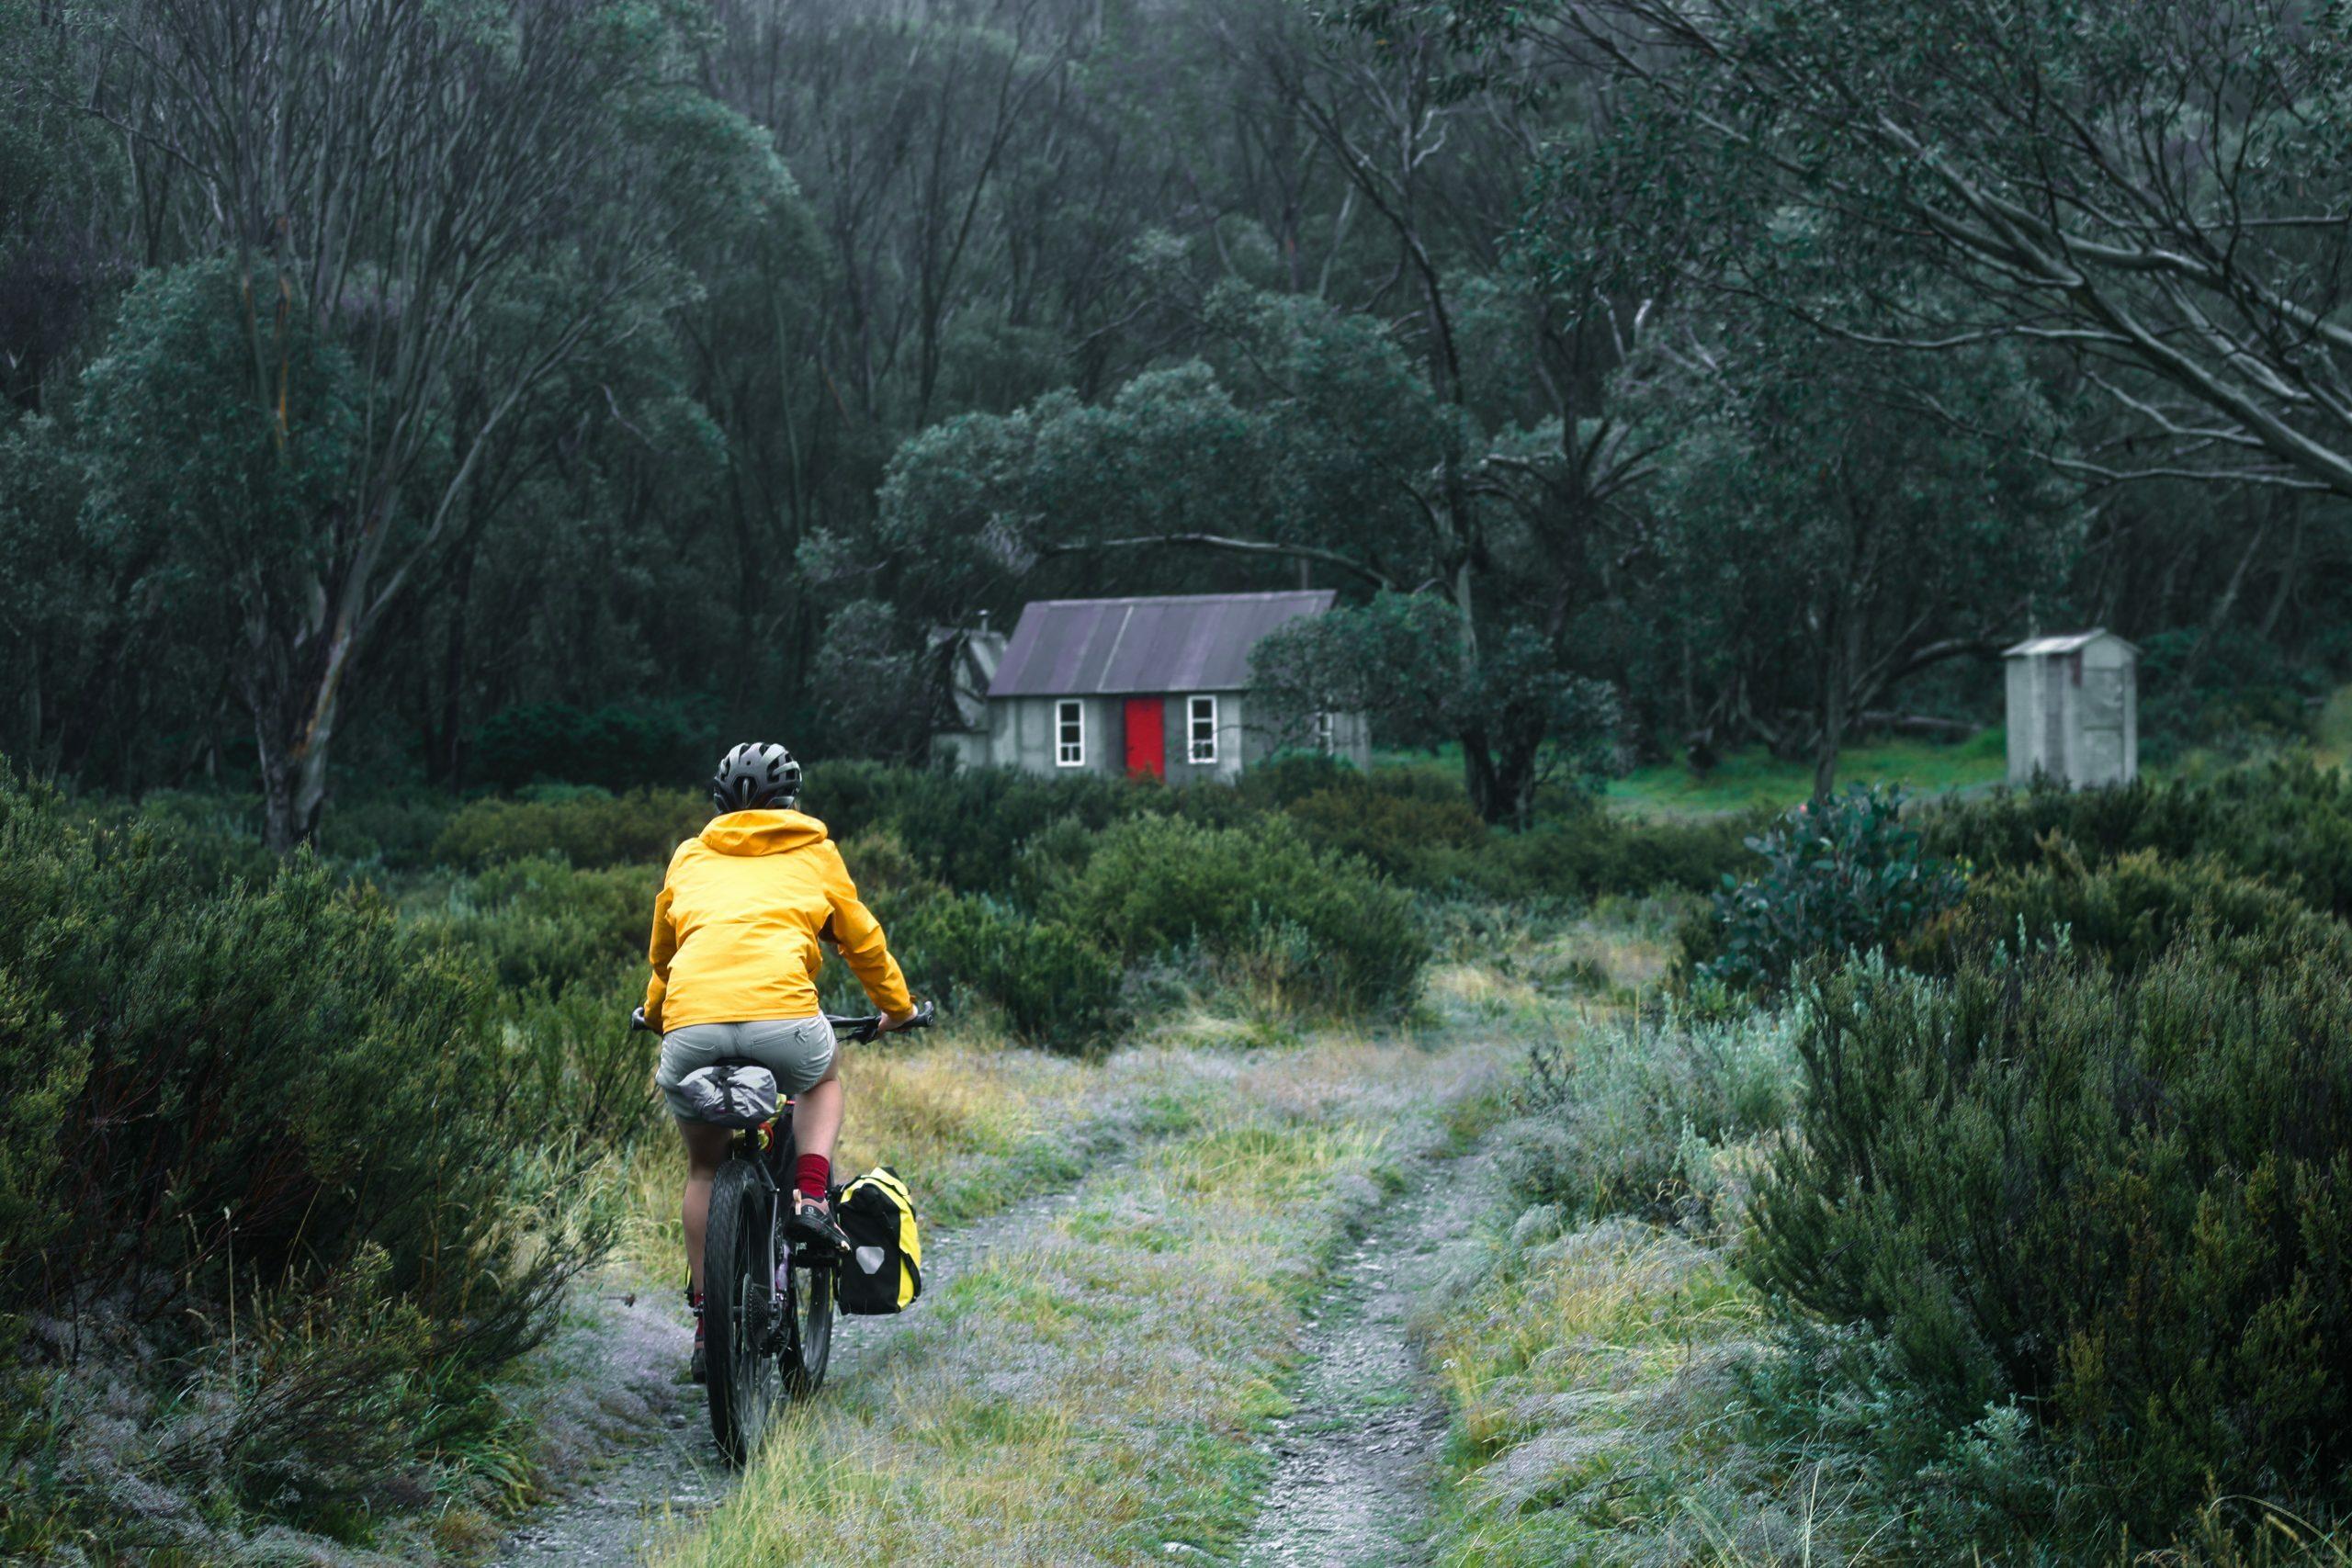 Bikepacking to Horse Camp Hut, Kosciuszko National Park